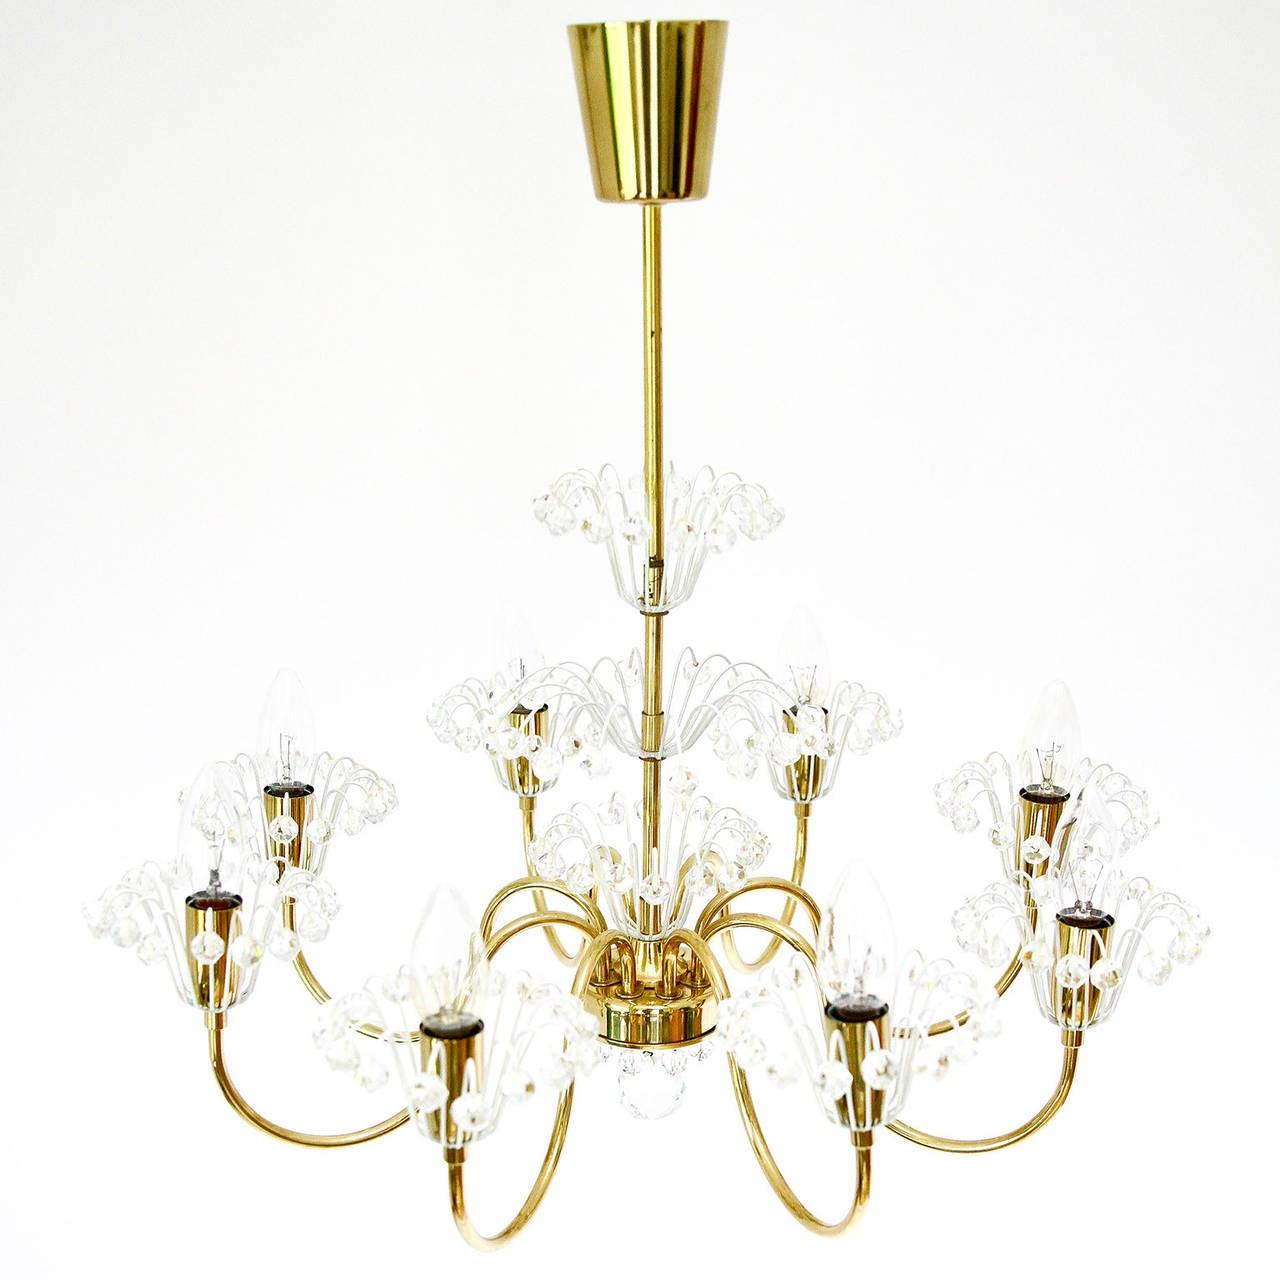 Mid-Century Modern Emil Stejnar Chandelier for Rupert Nikoll, Brass and Glass, 1950s For Sale